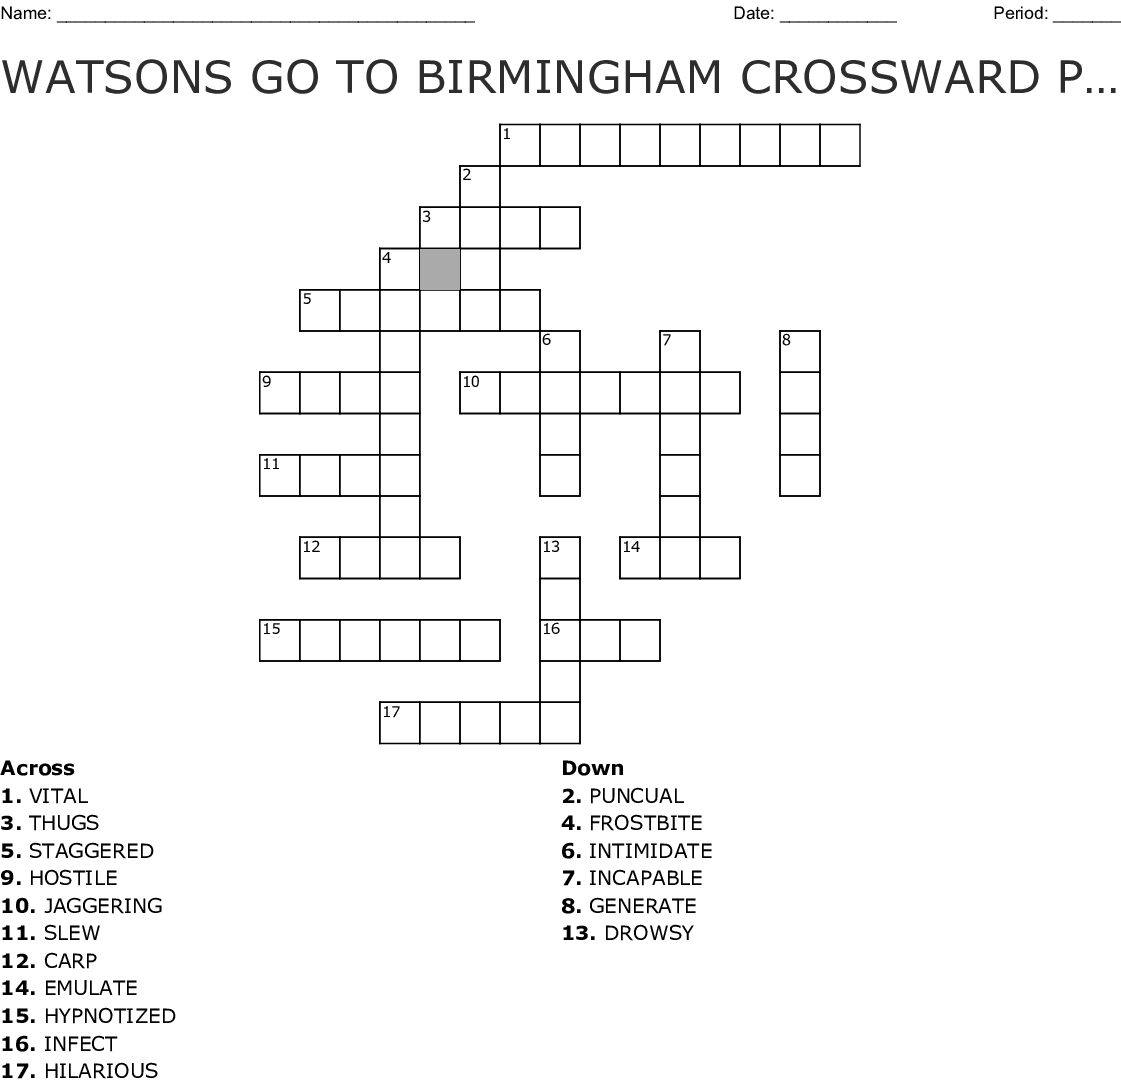 Watsons Go To Birmingham Crossward Puzzle Crossword